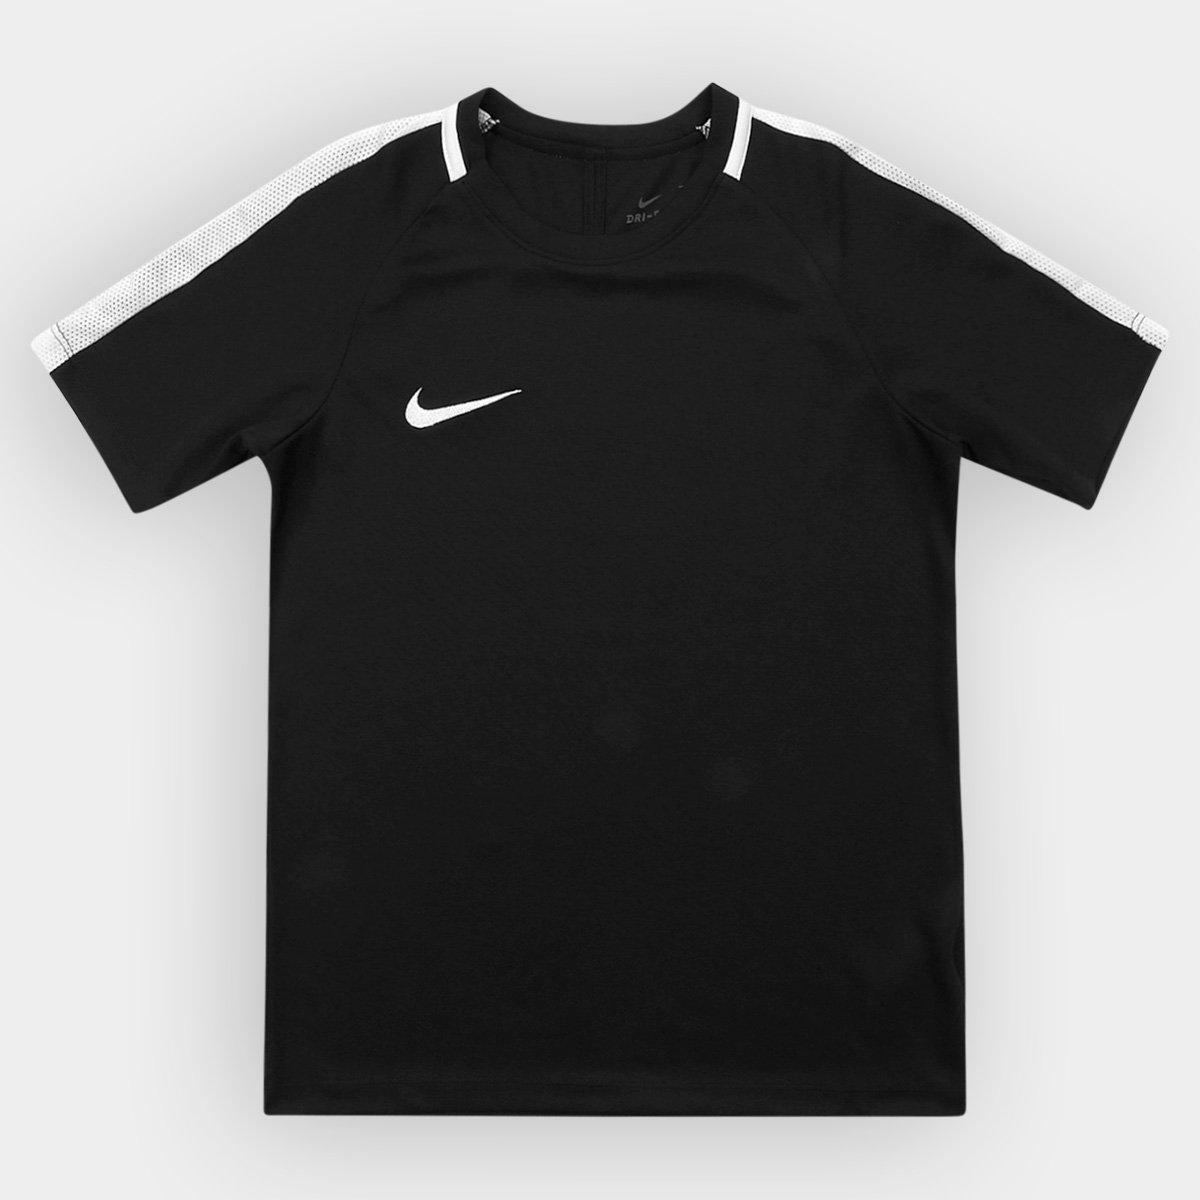 24b4bba295c Camisa Infantil Nike Dry Academy SS - Preto e Branco - Compre Agora ...